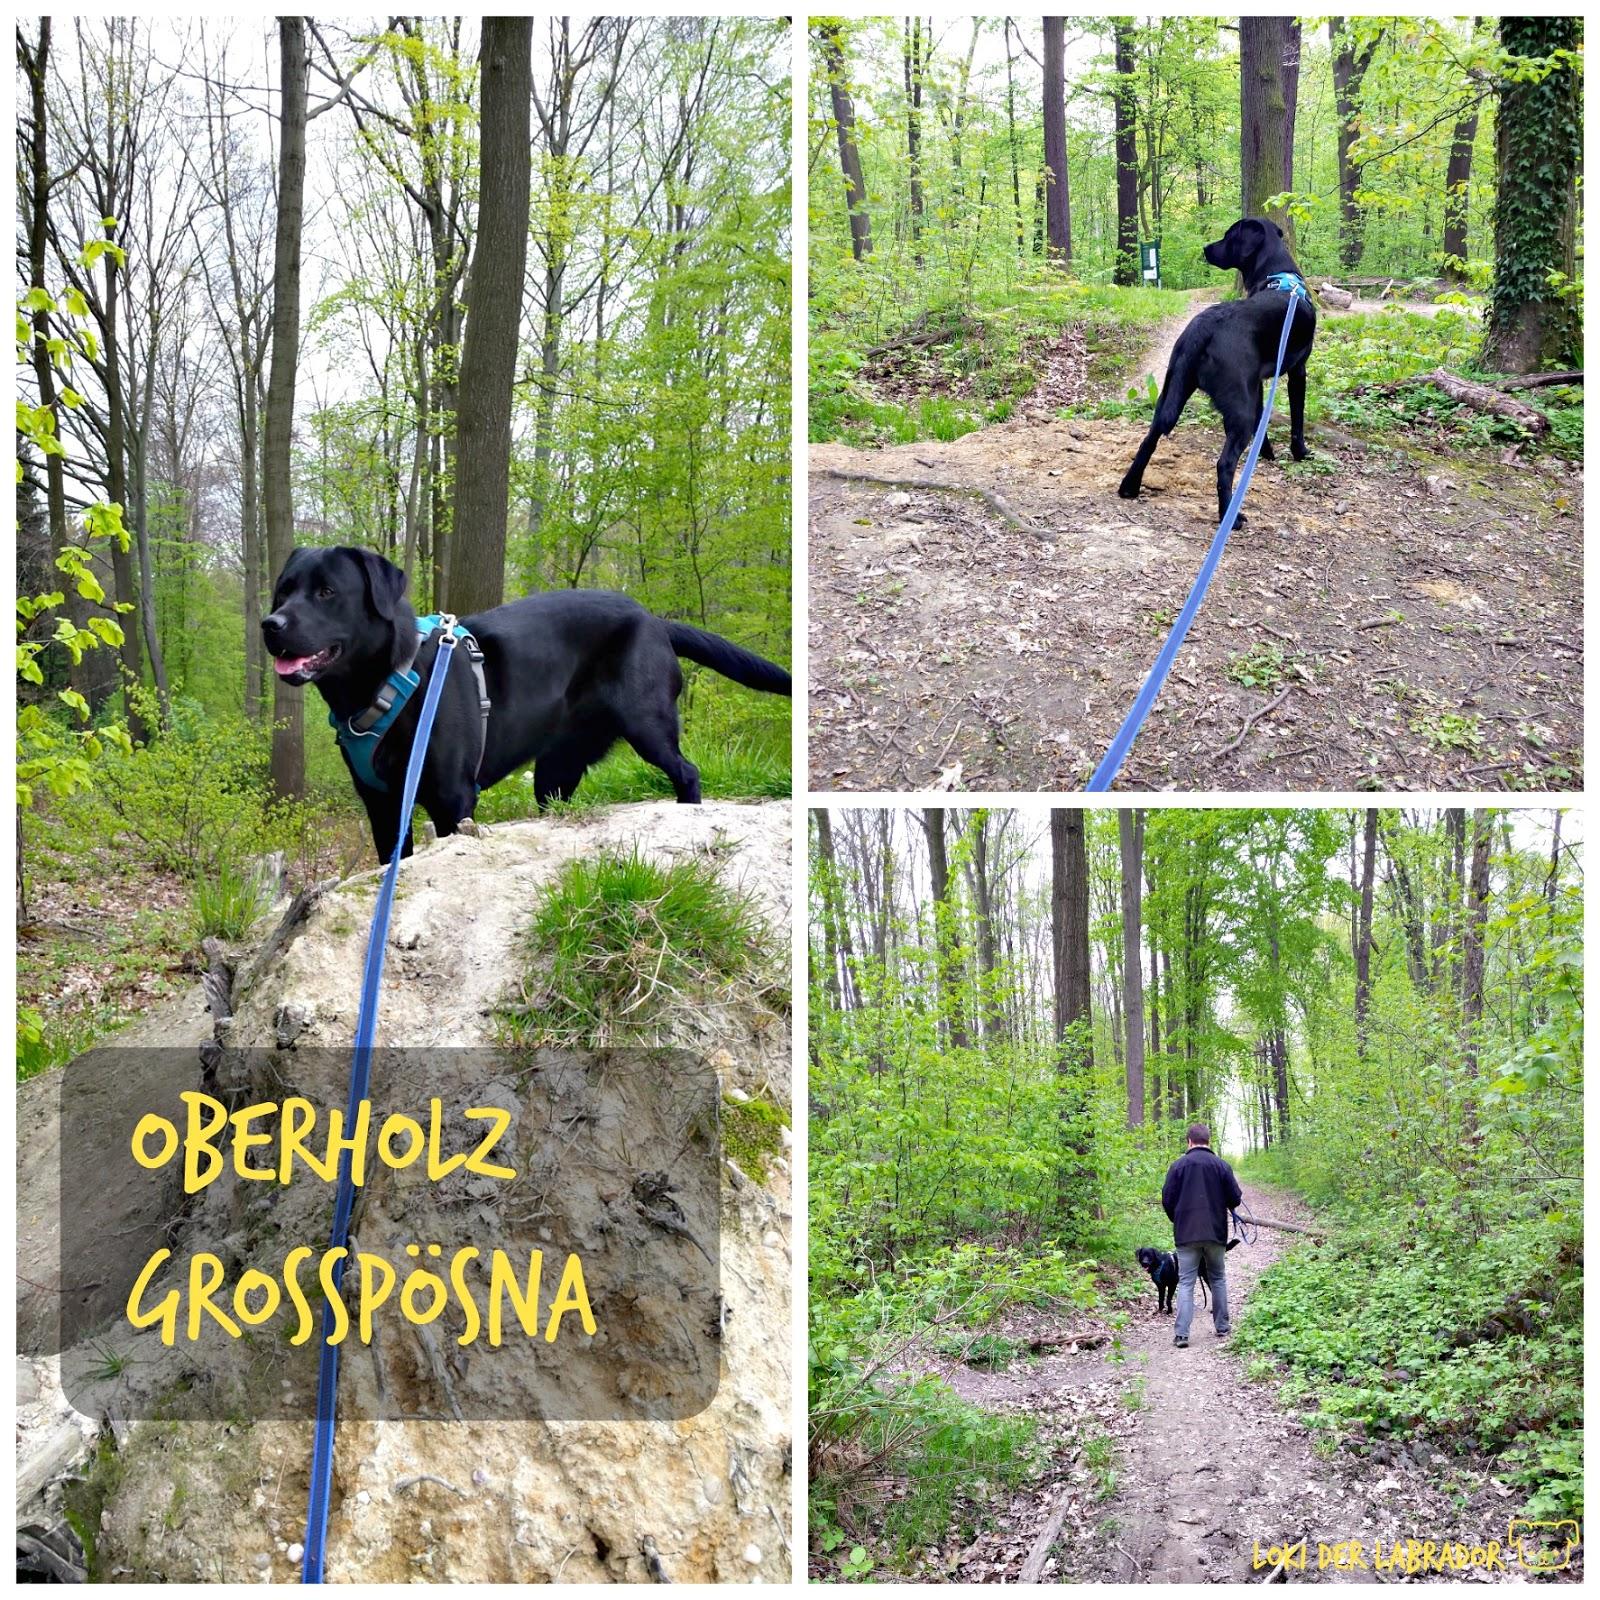 Oberholz Großpösna Labrador